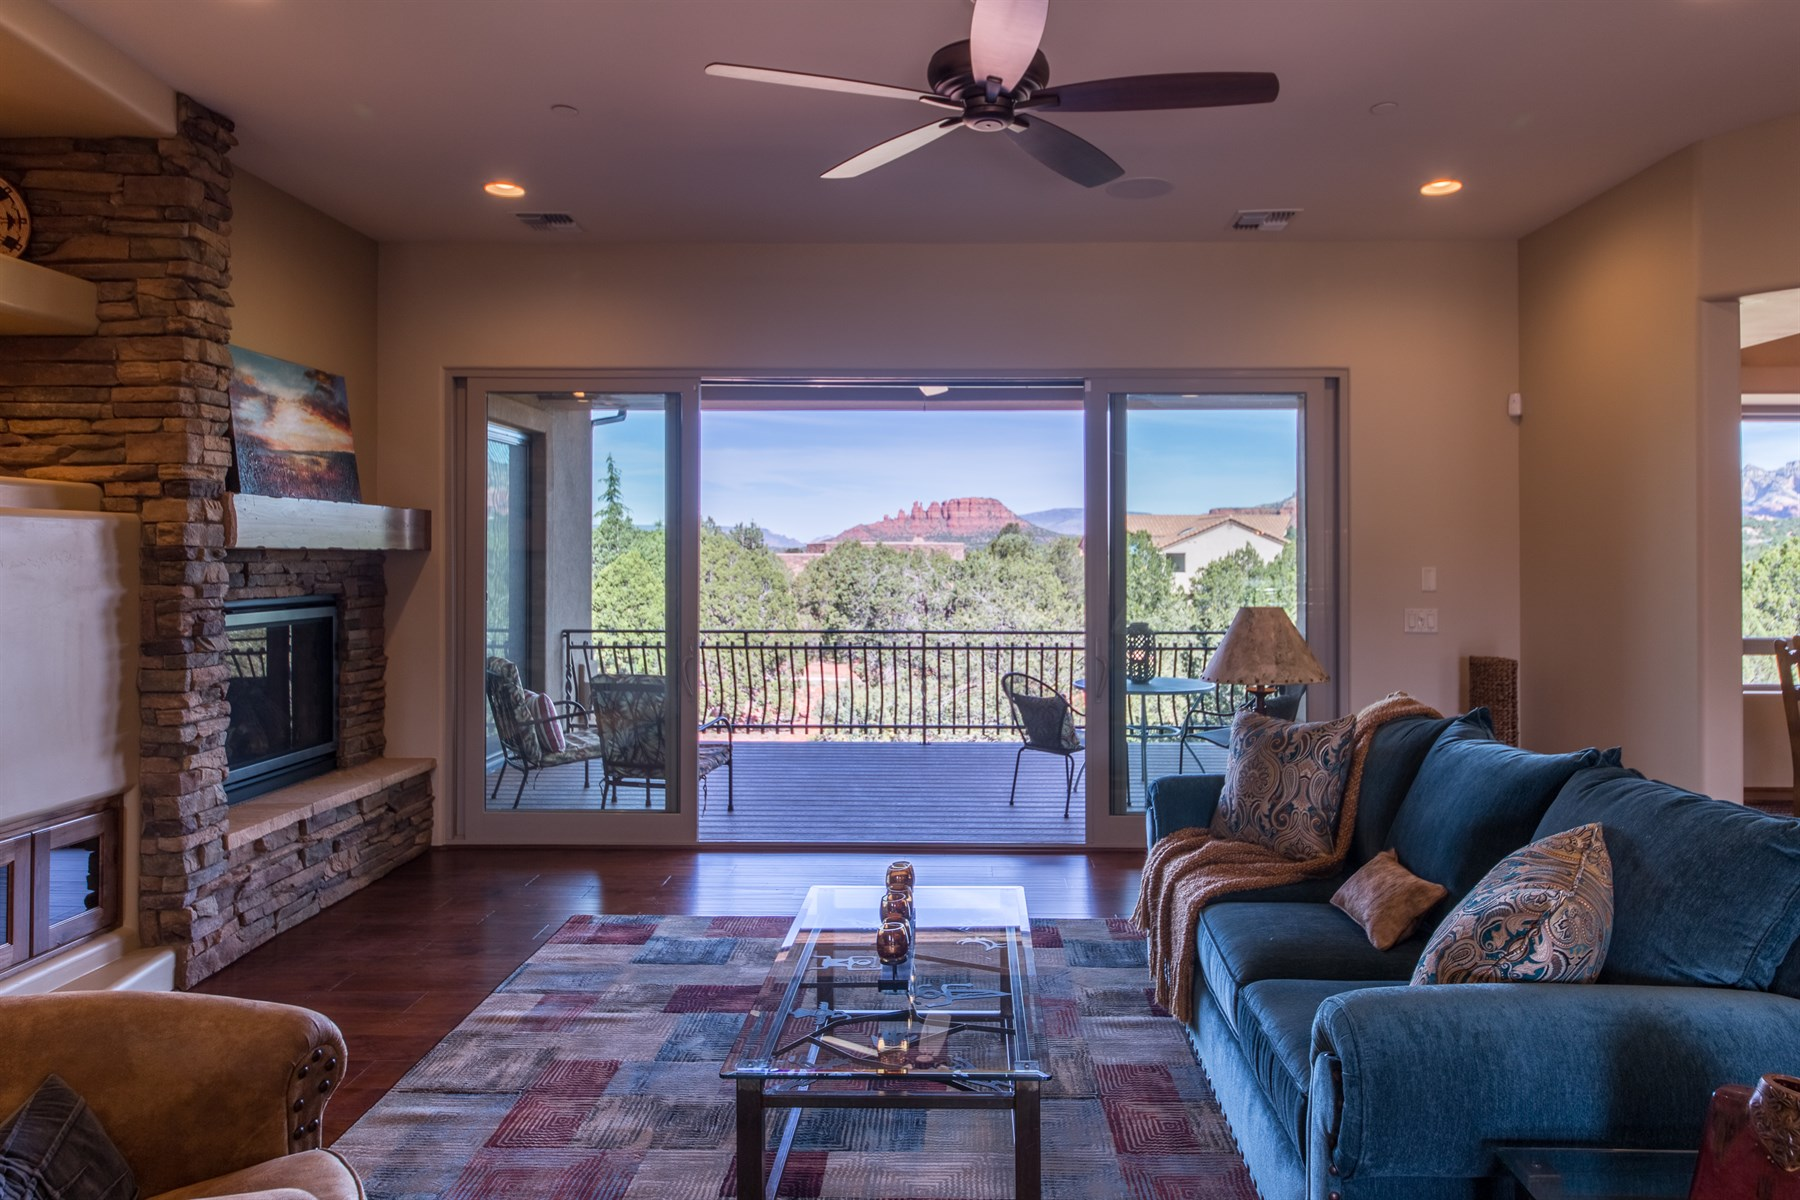 Maison unifamiliale pour l Vente à Turn-key ready brand new 2015 ''Energy Star'' certified and solar luxury home 150 RIMSTONE CIR Sedona, Arizona 86336 États-Unis